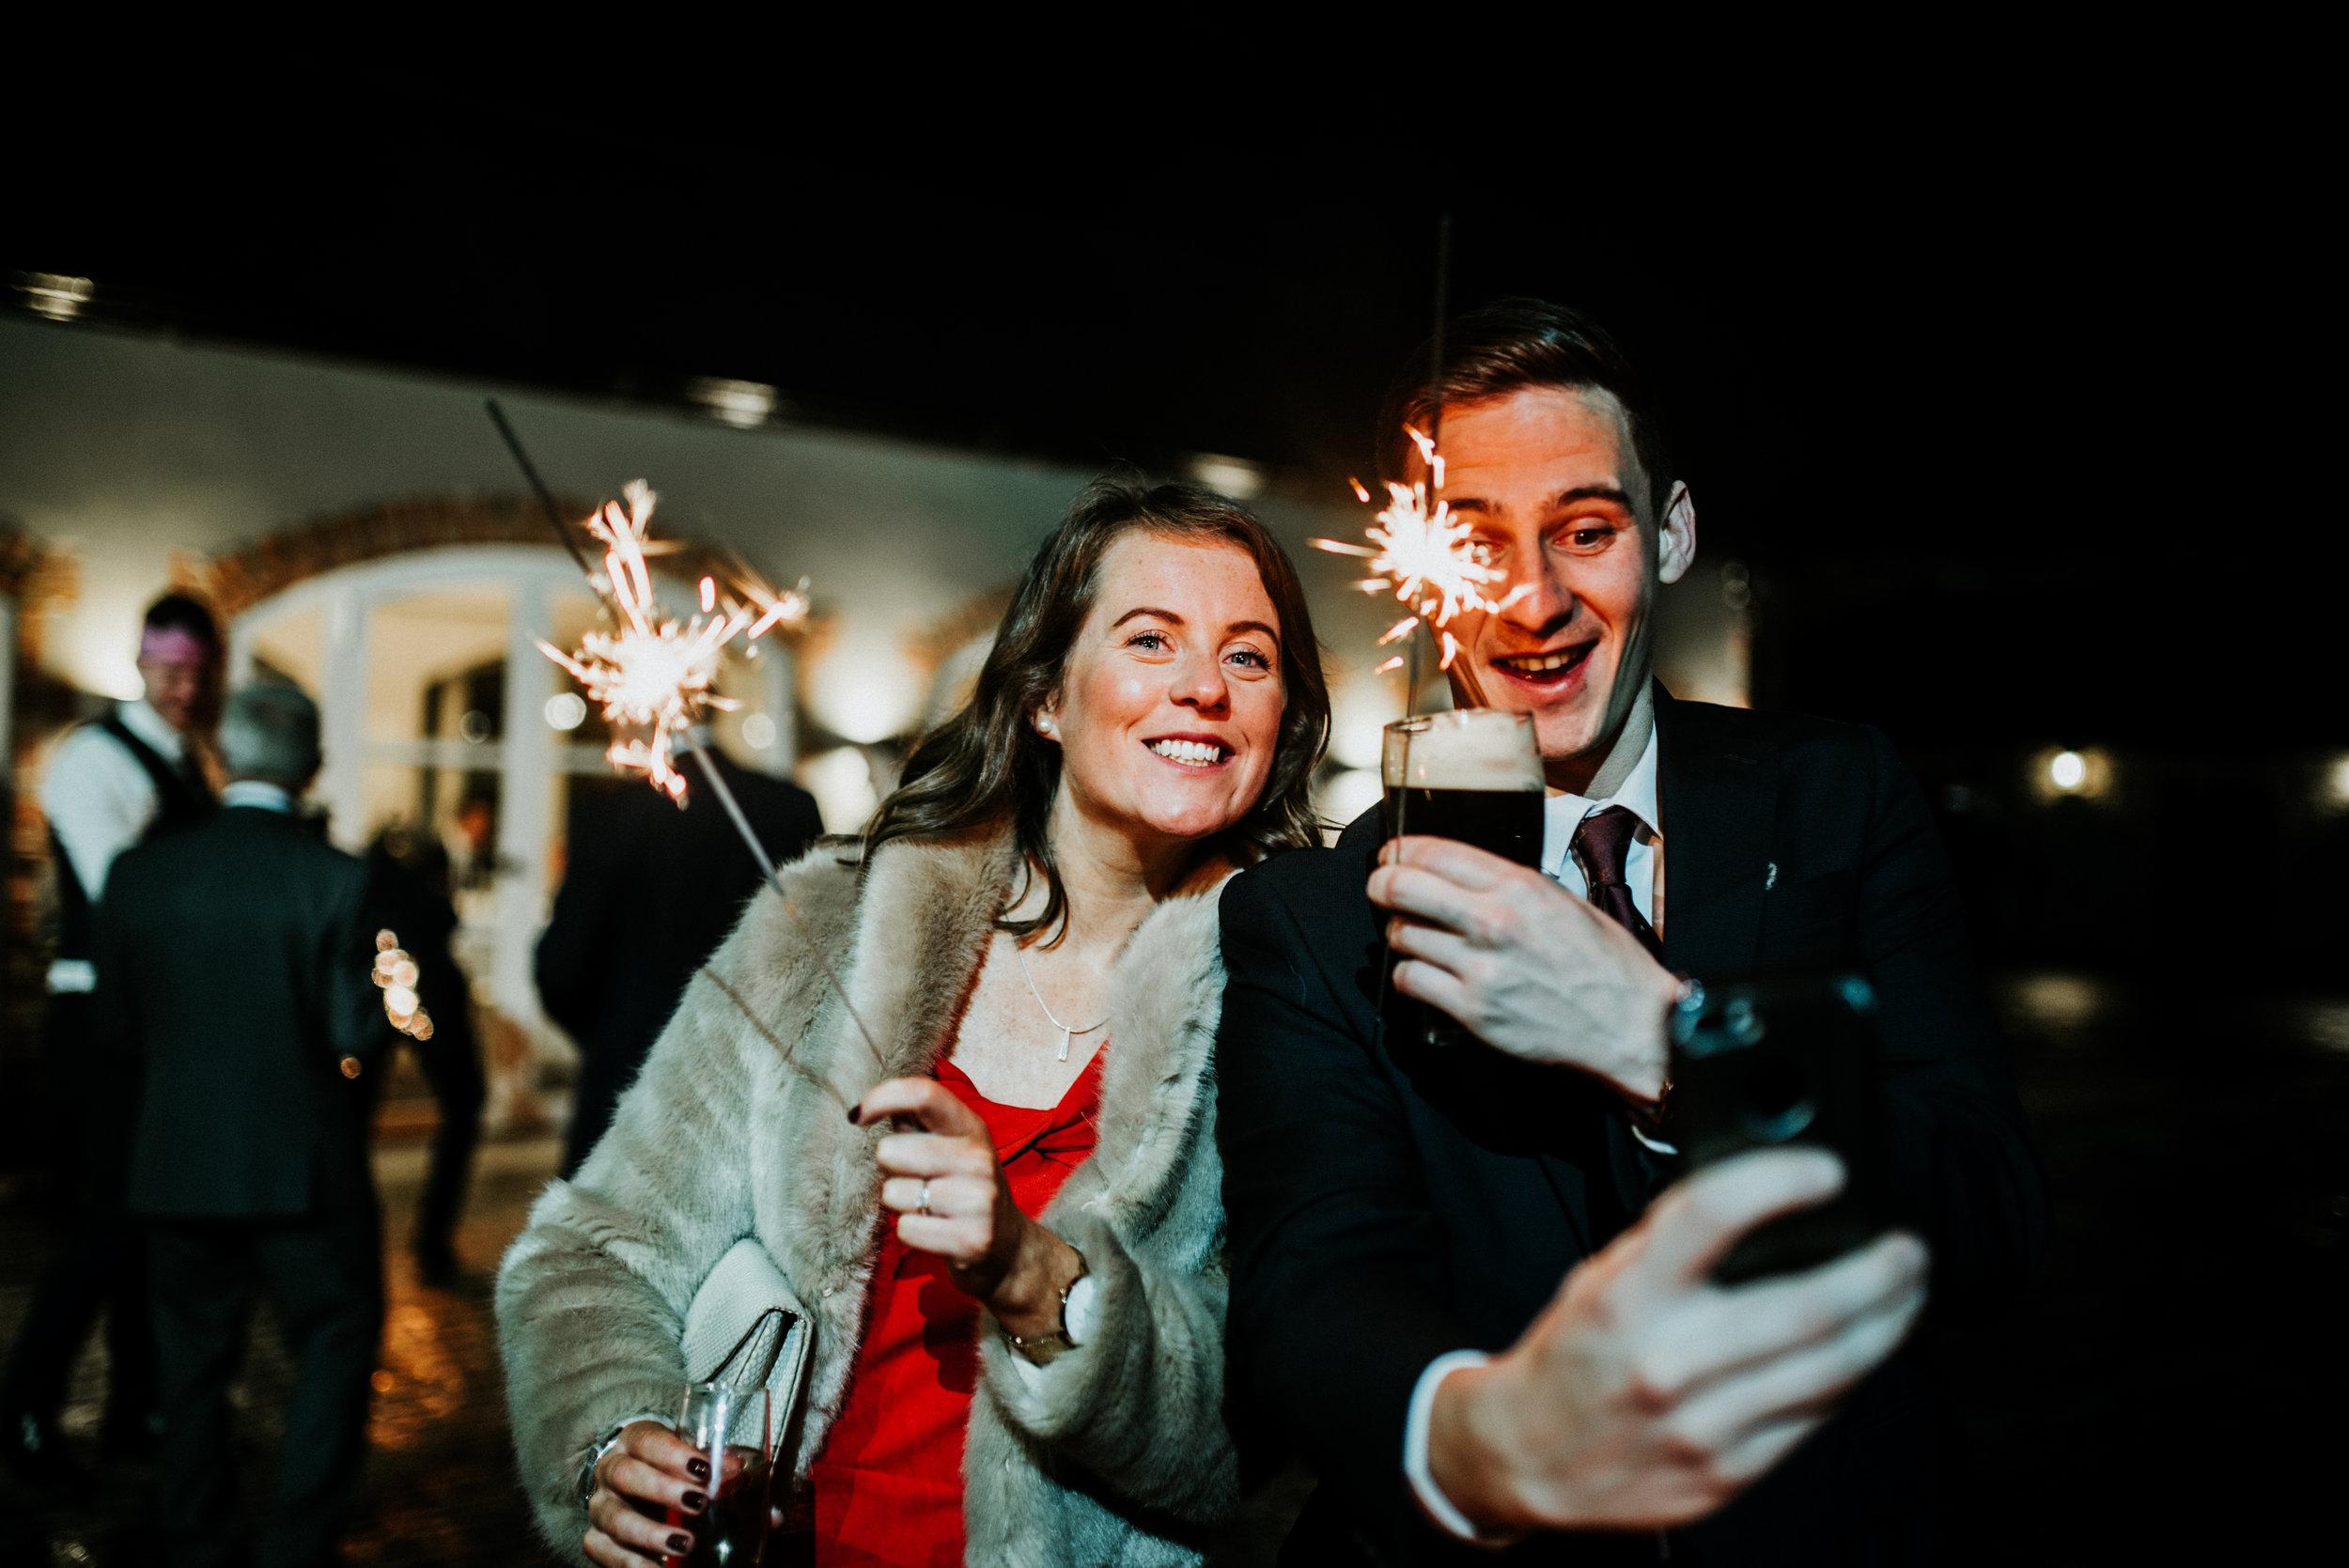 larchfield estate wedding, wedding venues northern ireland, barn wedding venues northern ireland, wedding photos larchfield estate, shane todd wedding, wedding sparklers, irish wedding (7).jpg